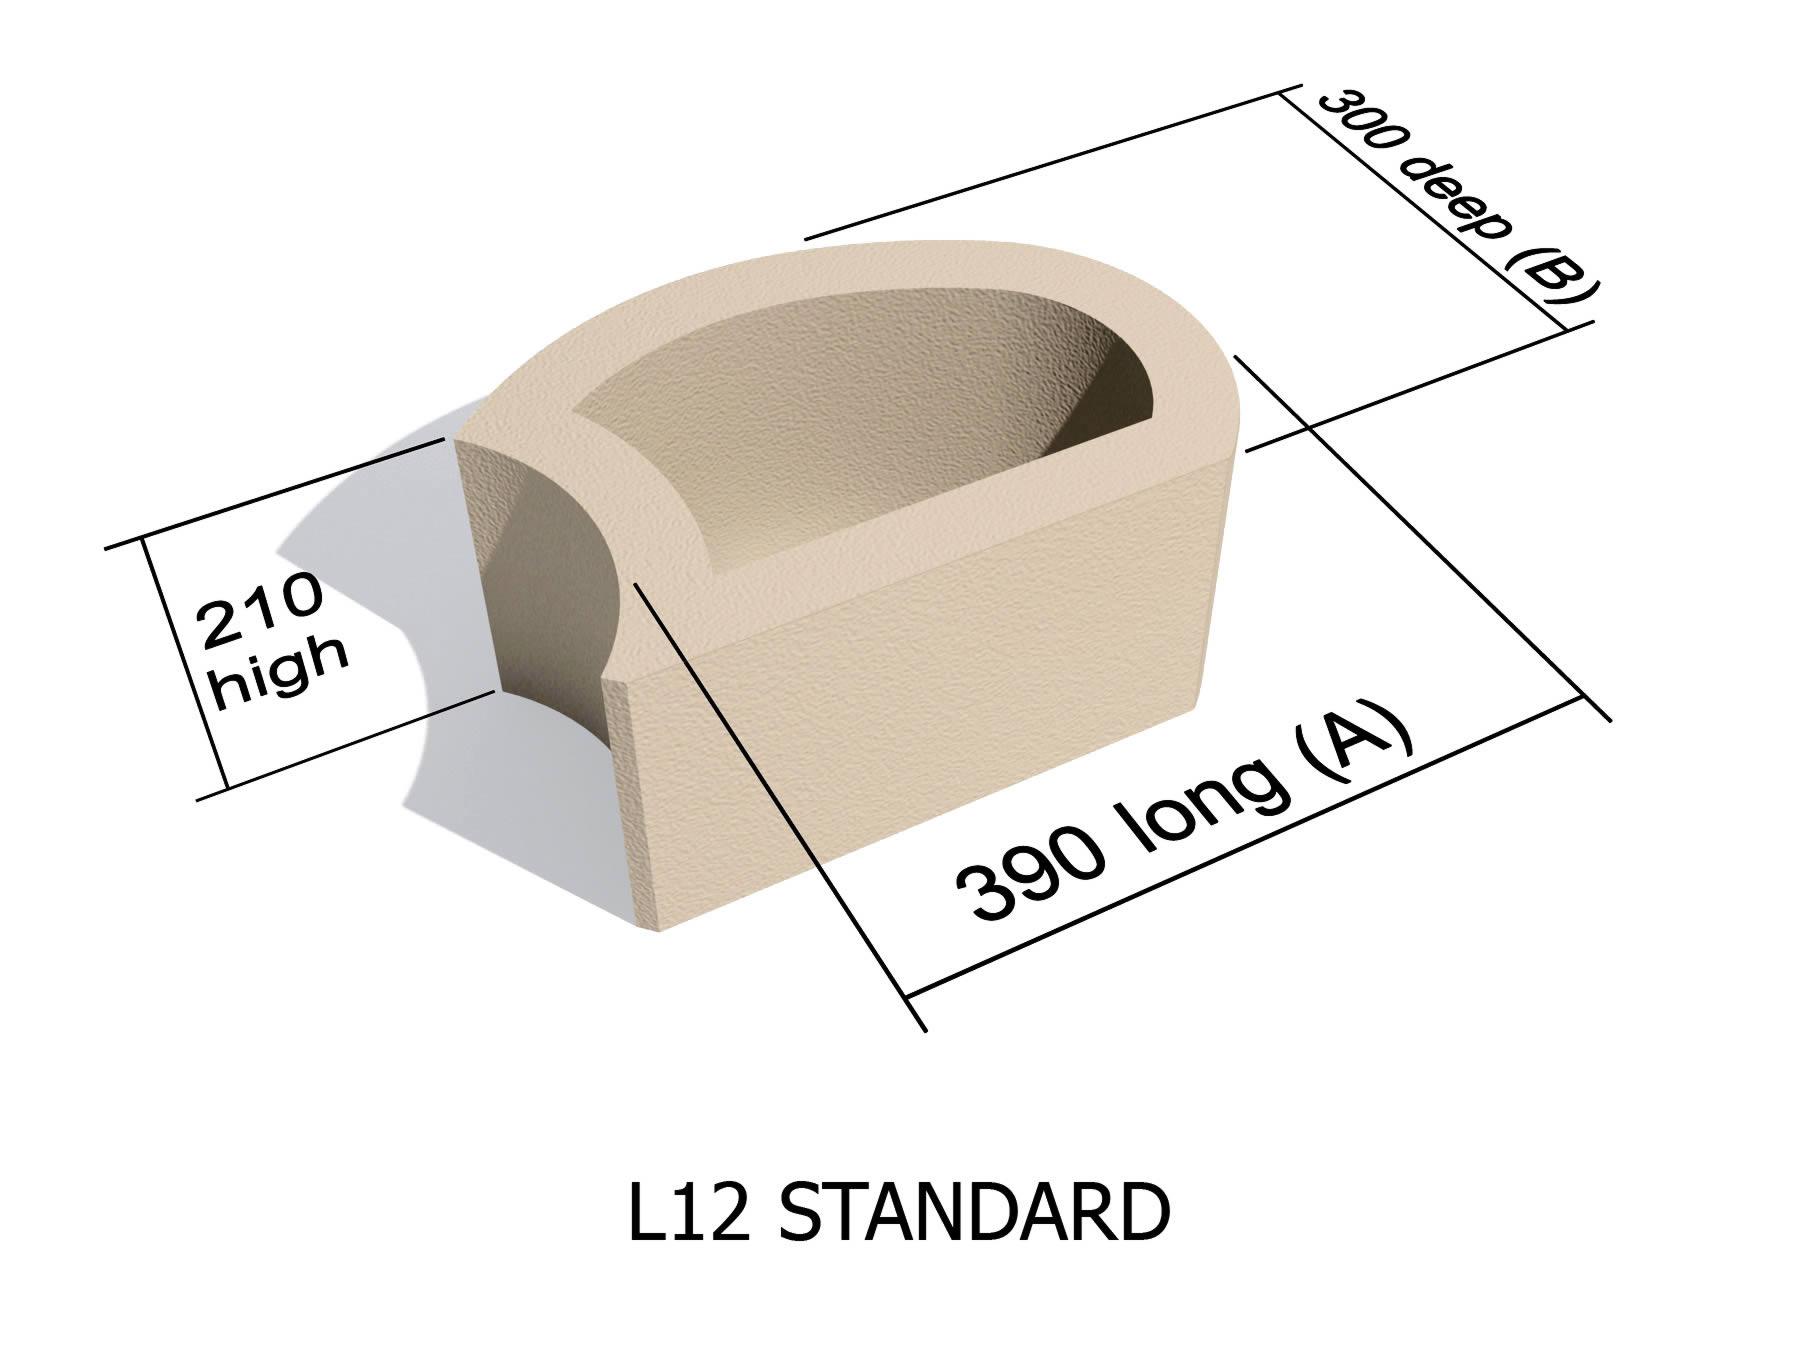 L12 smooth face retaining block